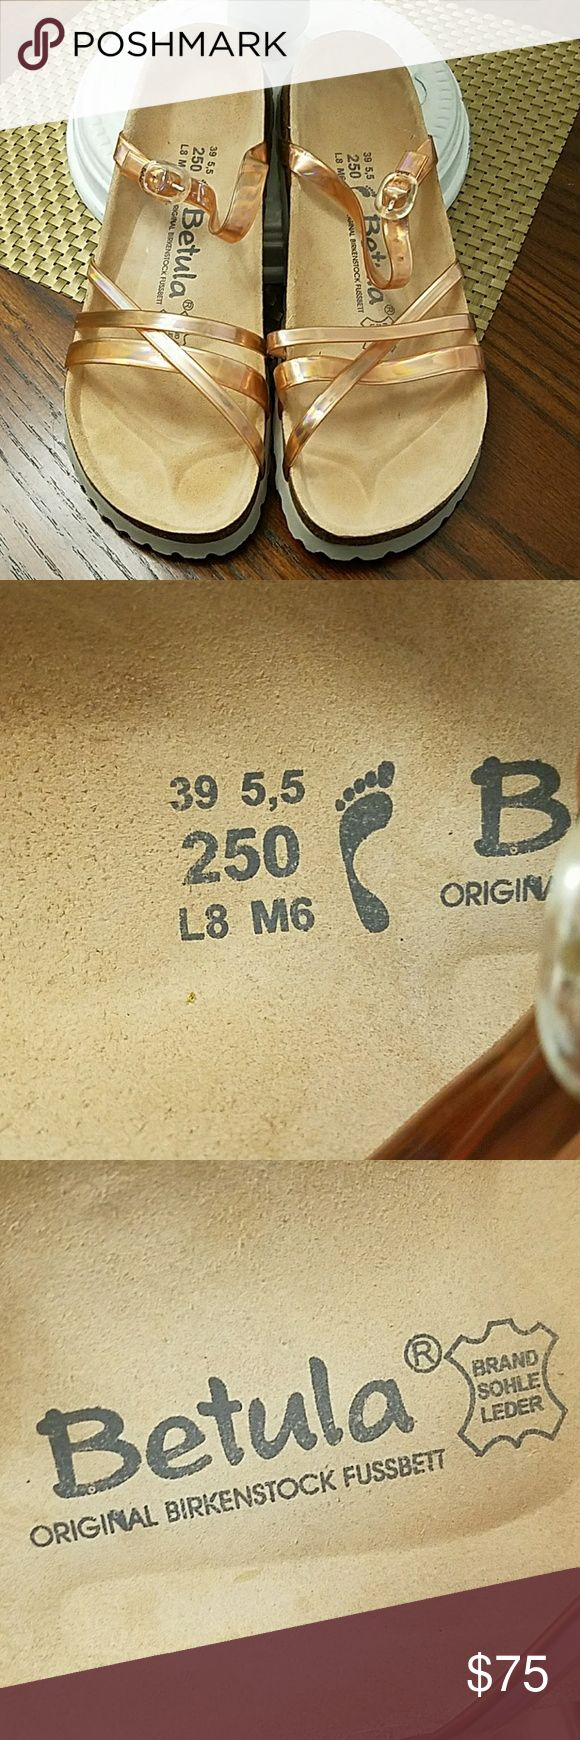 Betula Original Birkenstock Sandals NEW Brand new, no damage.  Ladies 8, men's 6. Rose pink straps. No box. Birkenstock Shoes Sandals